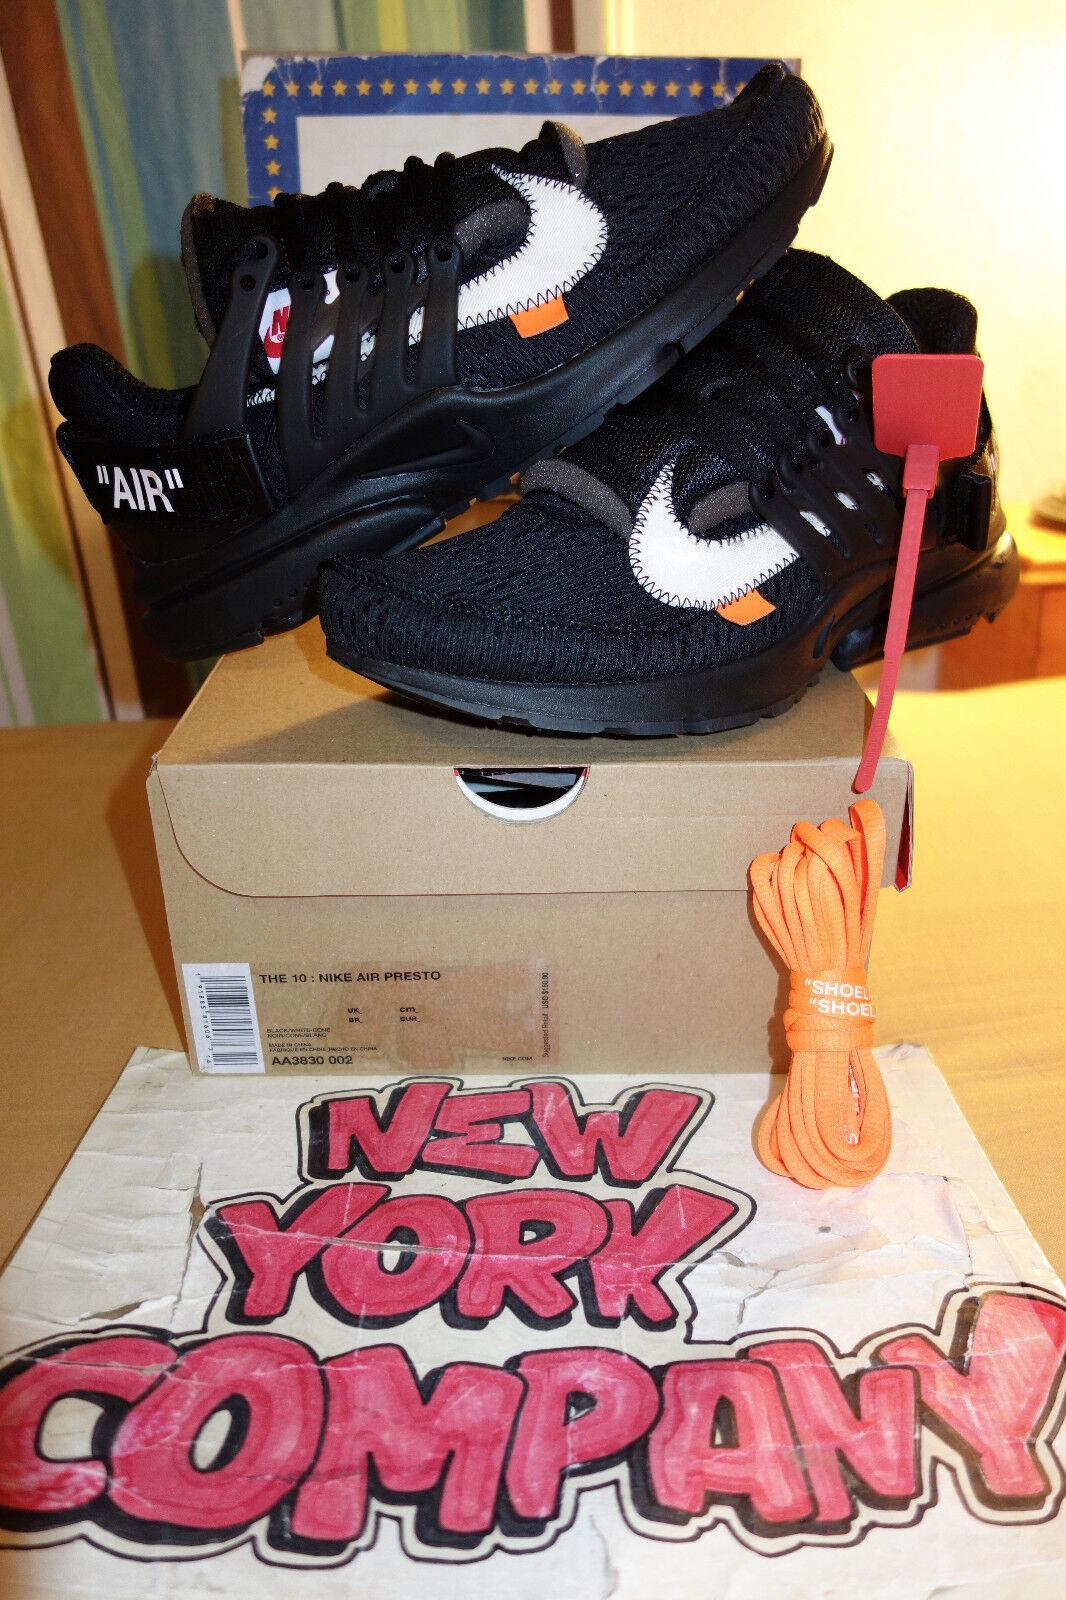 Nike The 10 : Nike Air Presto